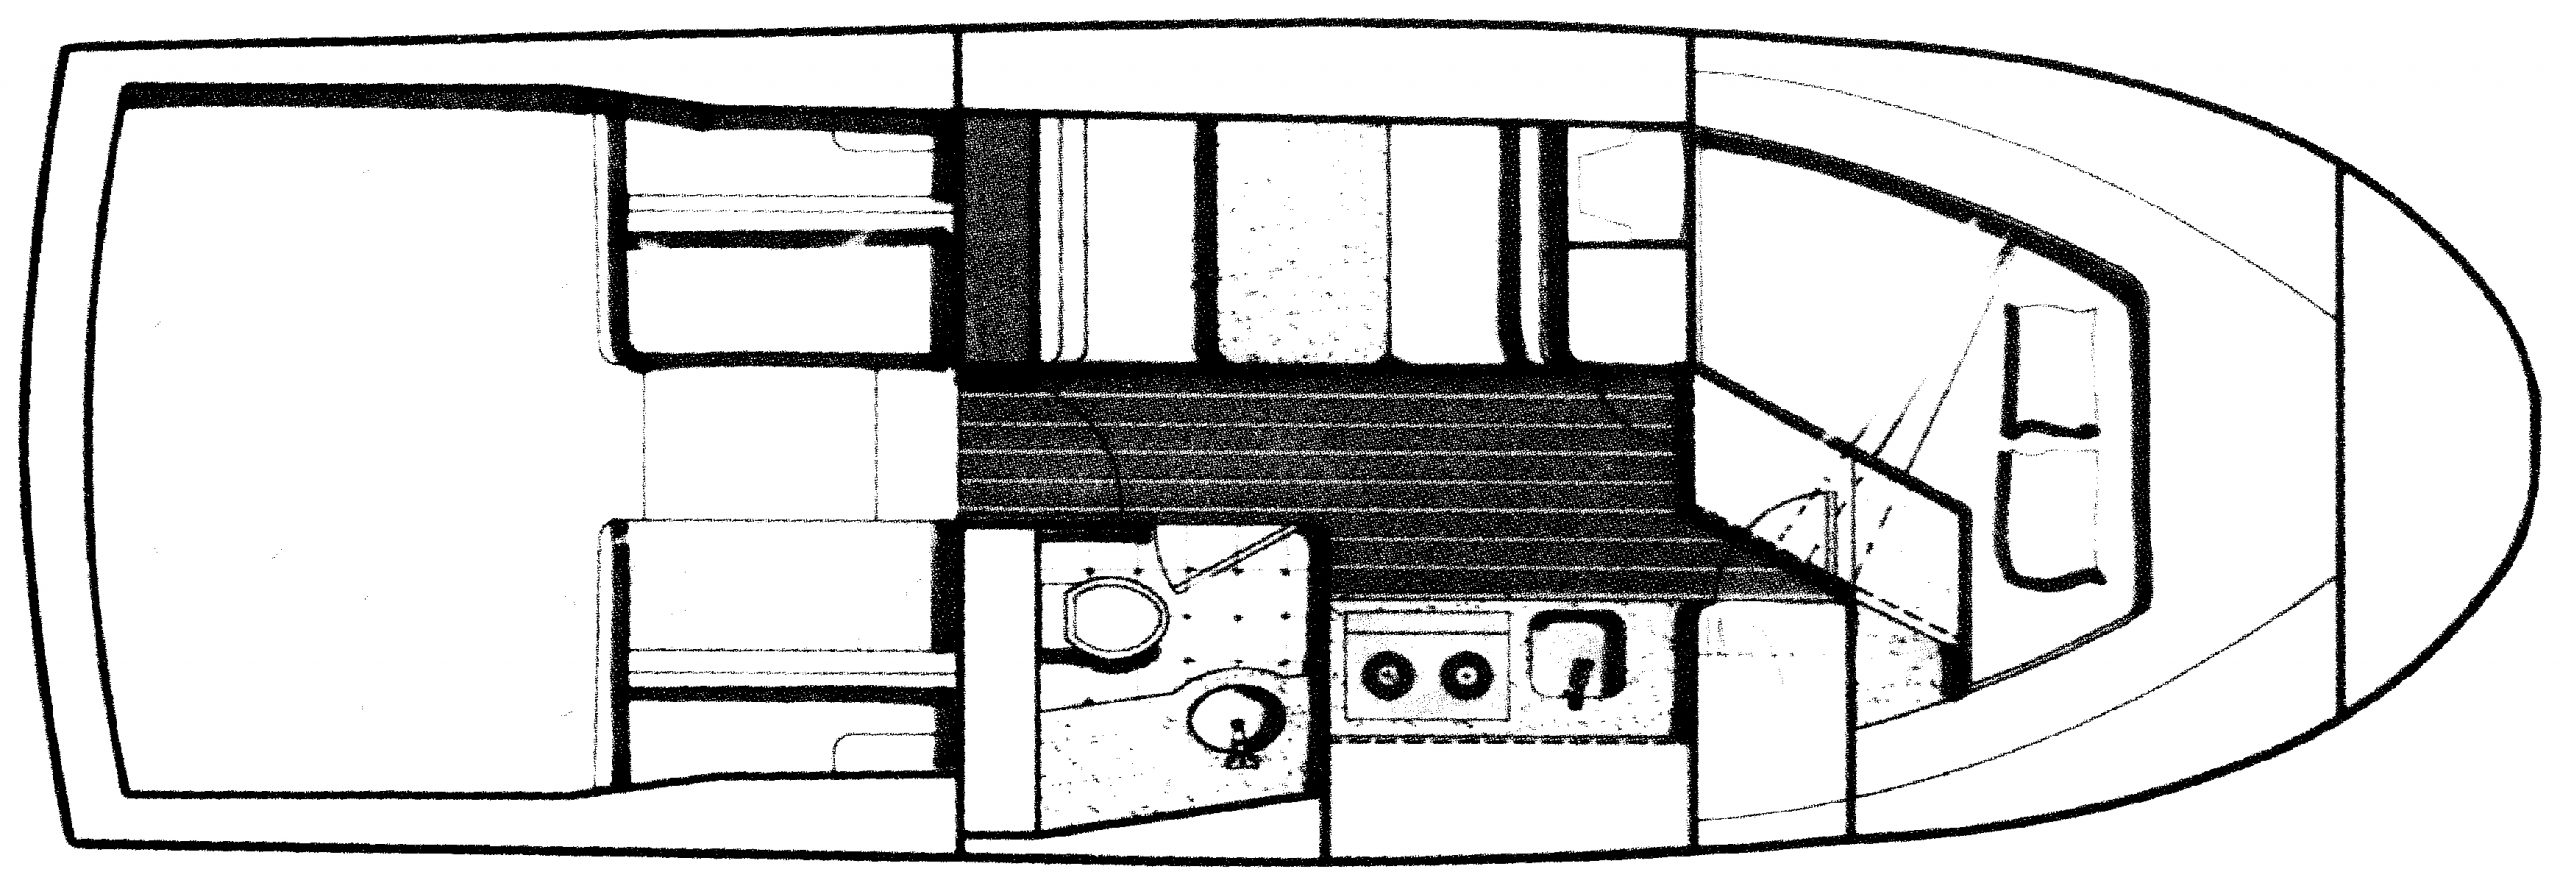 Blackfin 29 Flybridge Floor Plan 2